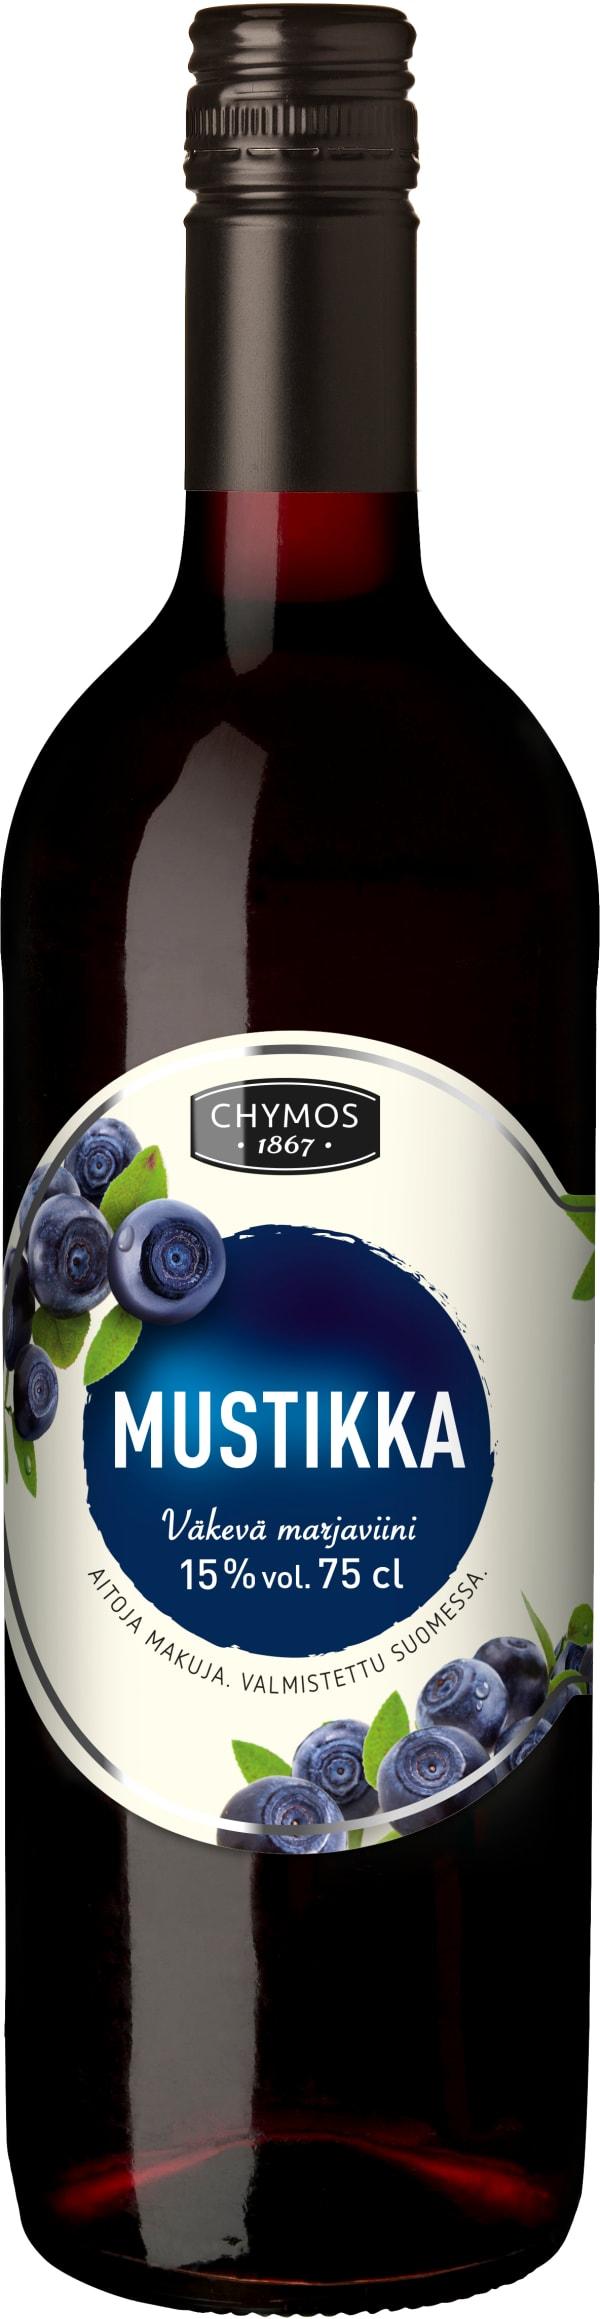 Chymos Mustikka Väkevä Marjaviini